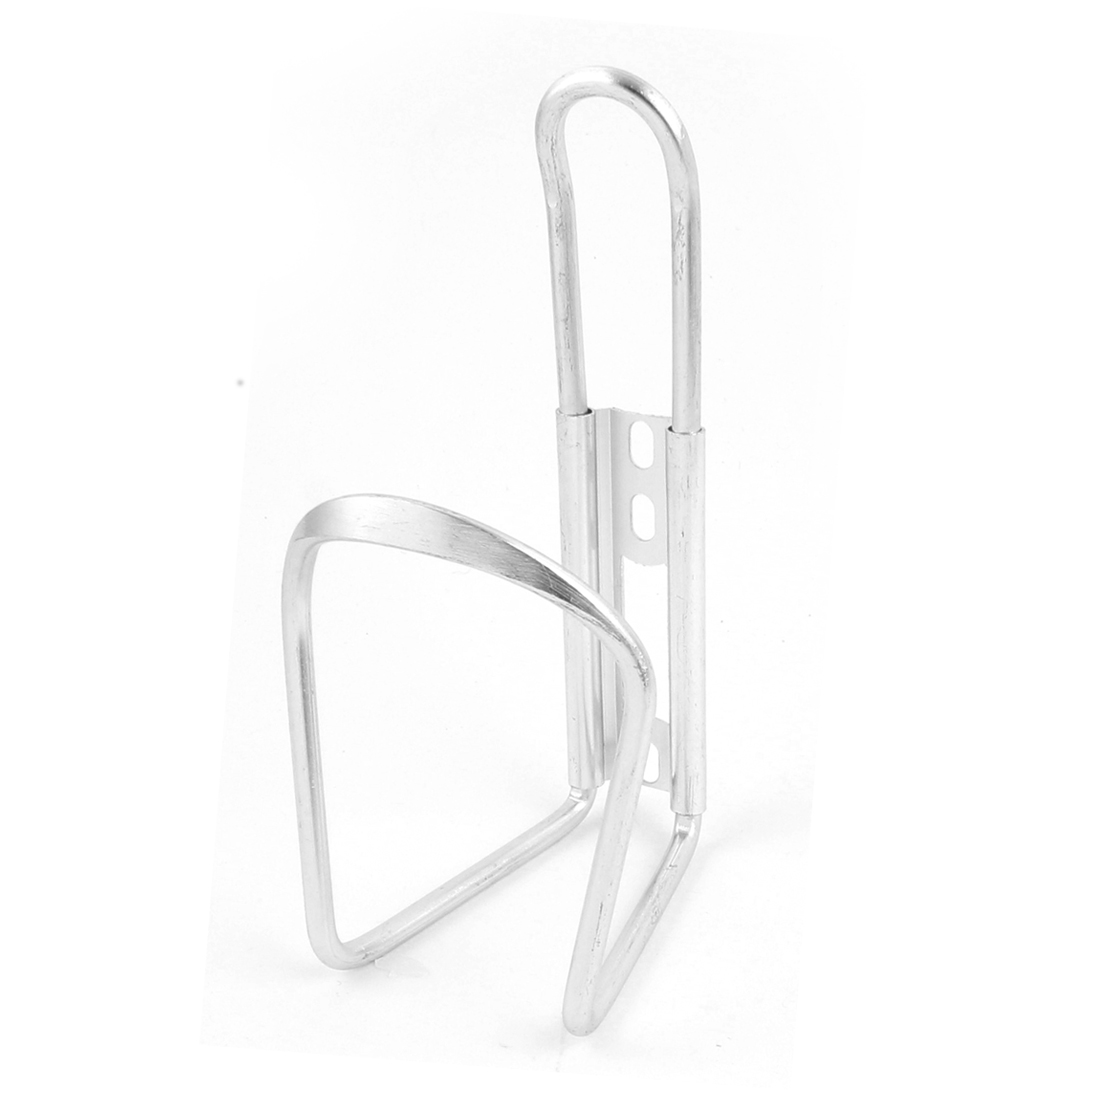 Metal Cycling Sport Bike Bicycle Drink Water Bottle Bracket Rack Holder Silver Tone